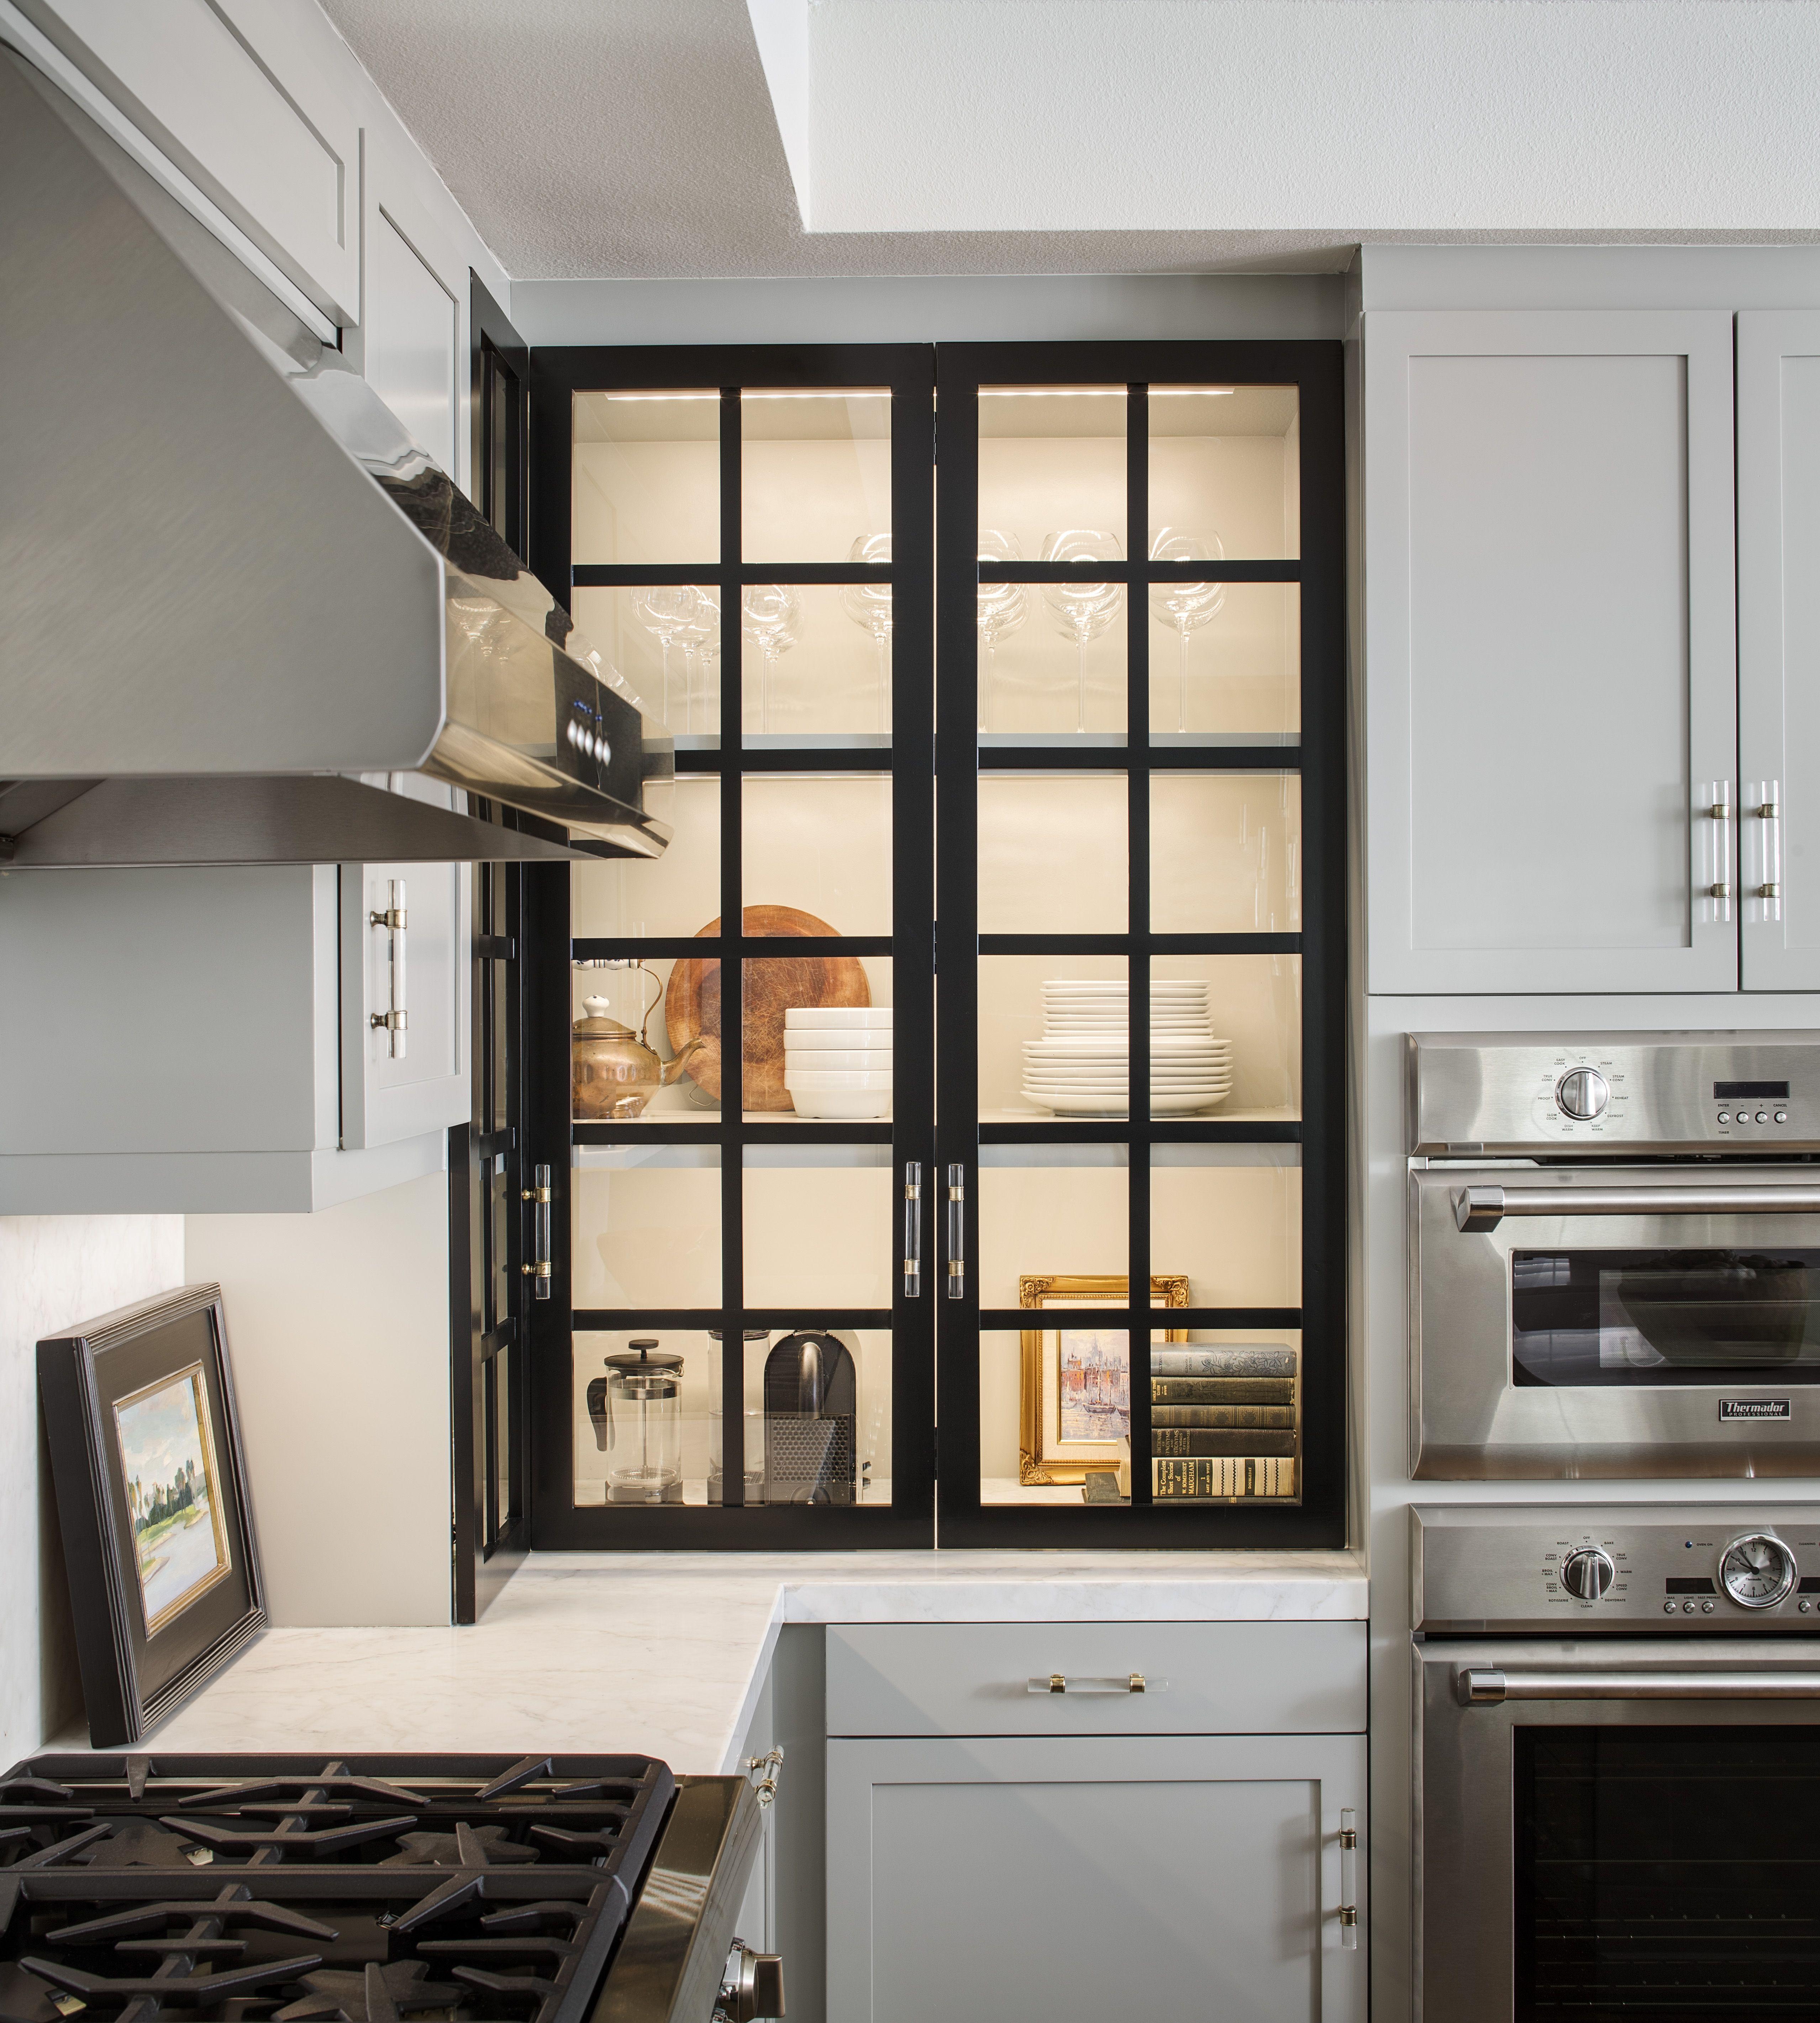 Photo Courtesy Of Chipper Hatter Glass Kitchen Cabinets New Kitchen Designs Kitchen Cabinets